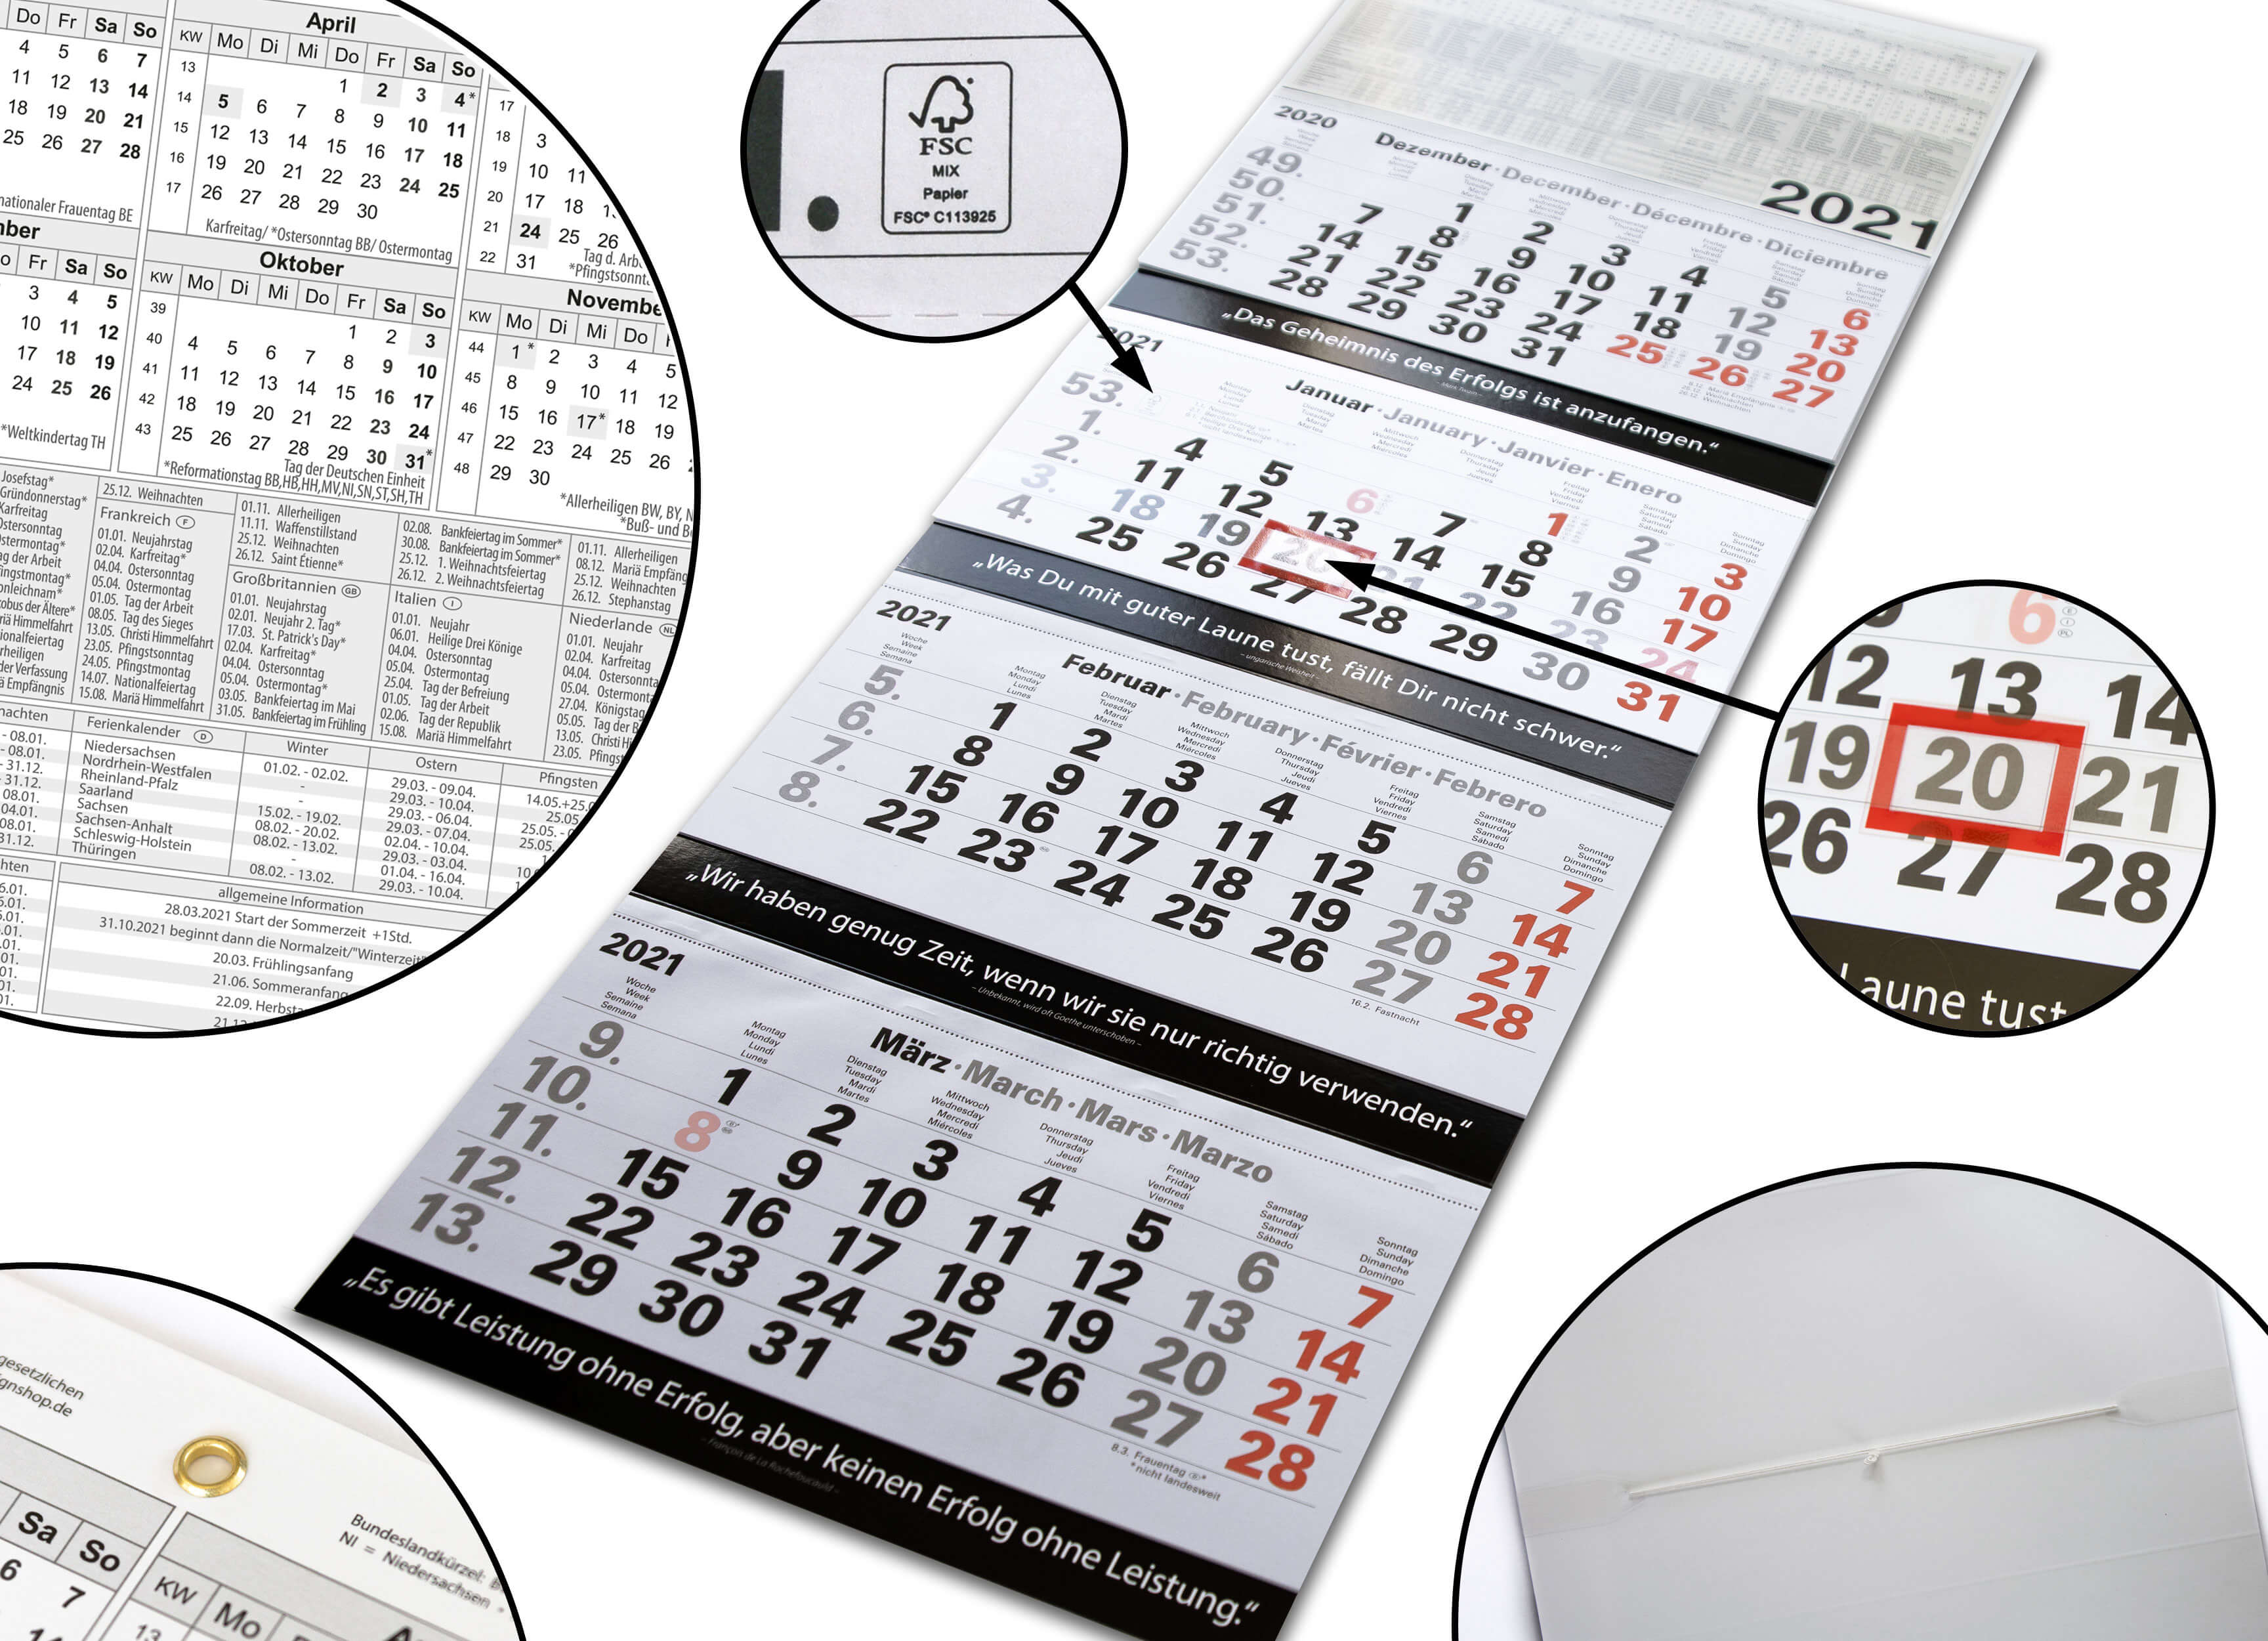 4-Monatskalender 2021 Wandkalender groß - Kombi 4 Monatskalender mit Datumsschieber